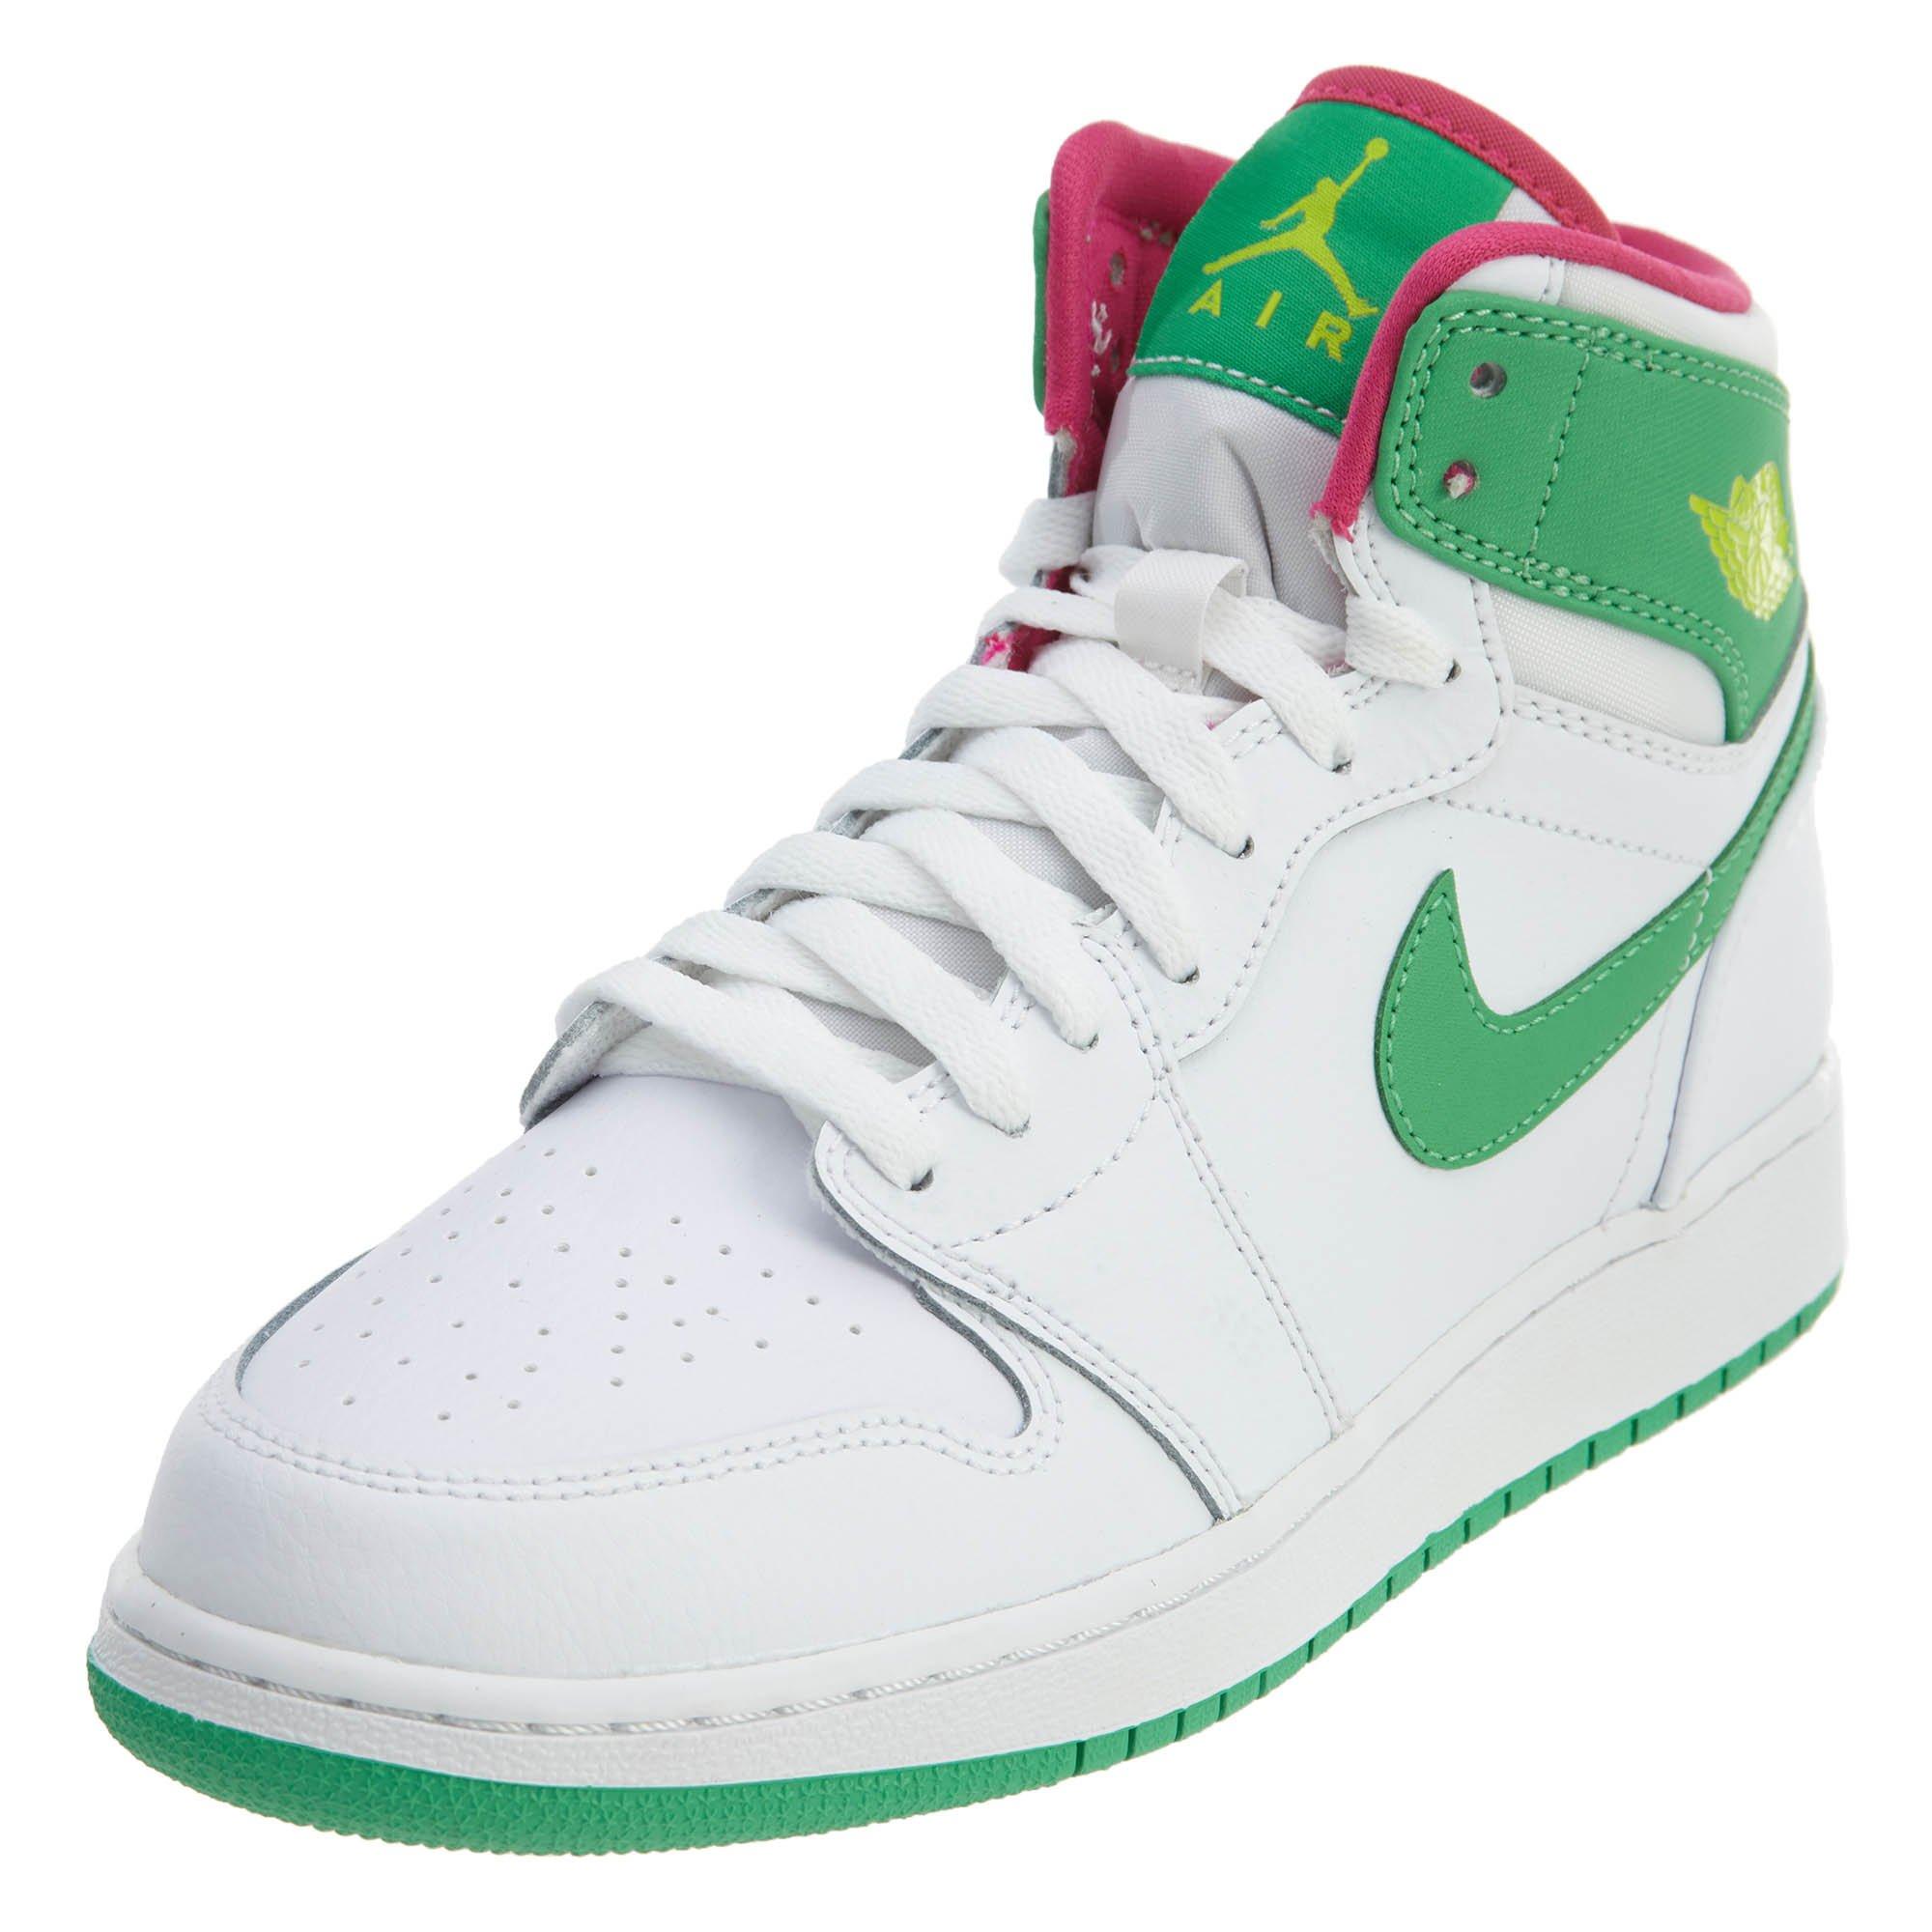 1b9c59215a85c6 Galleon - Jordan Nike Air 1 Retro High GG White Pink Green 332148-134  (Size  8.5Y)